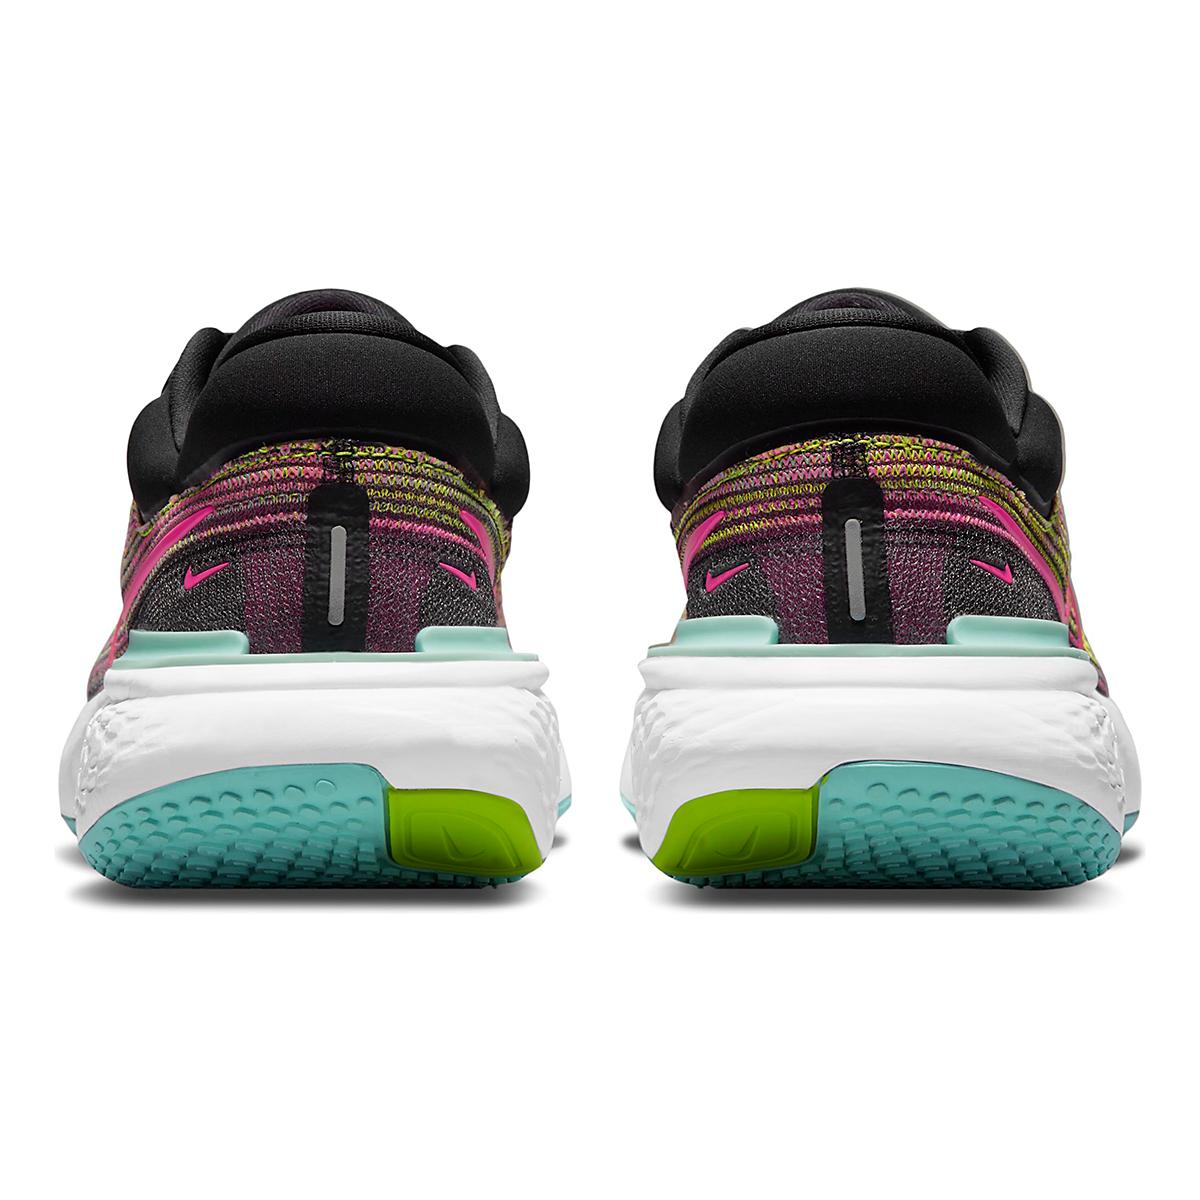 Women's Nike Zoomx Invincible Run FlyKnit Running Shoe - Color: Volt/Bright Mango/Black/Light Dew - Size: 5 - Width: Regular, Volt/Bright Mango/Black/Light Dew, large, image 5